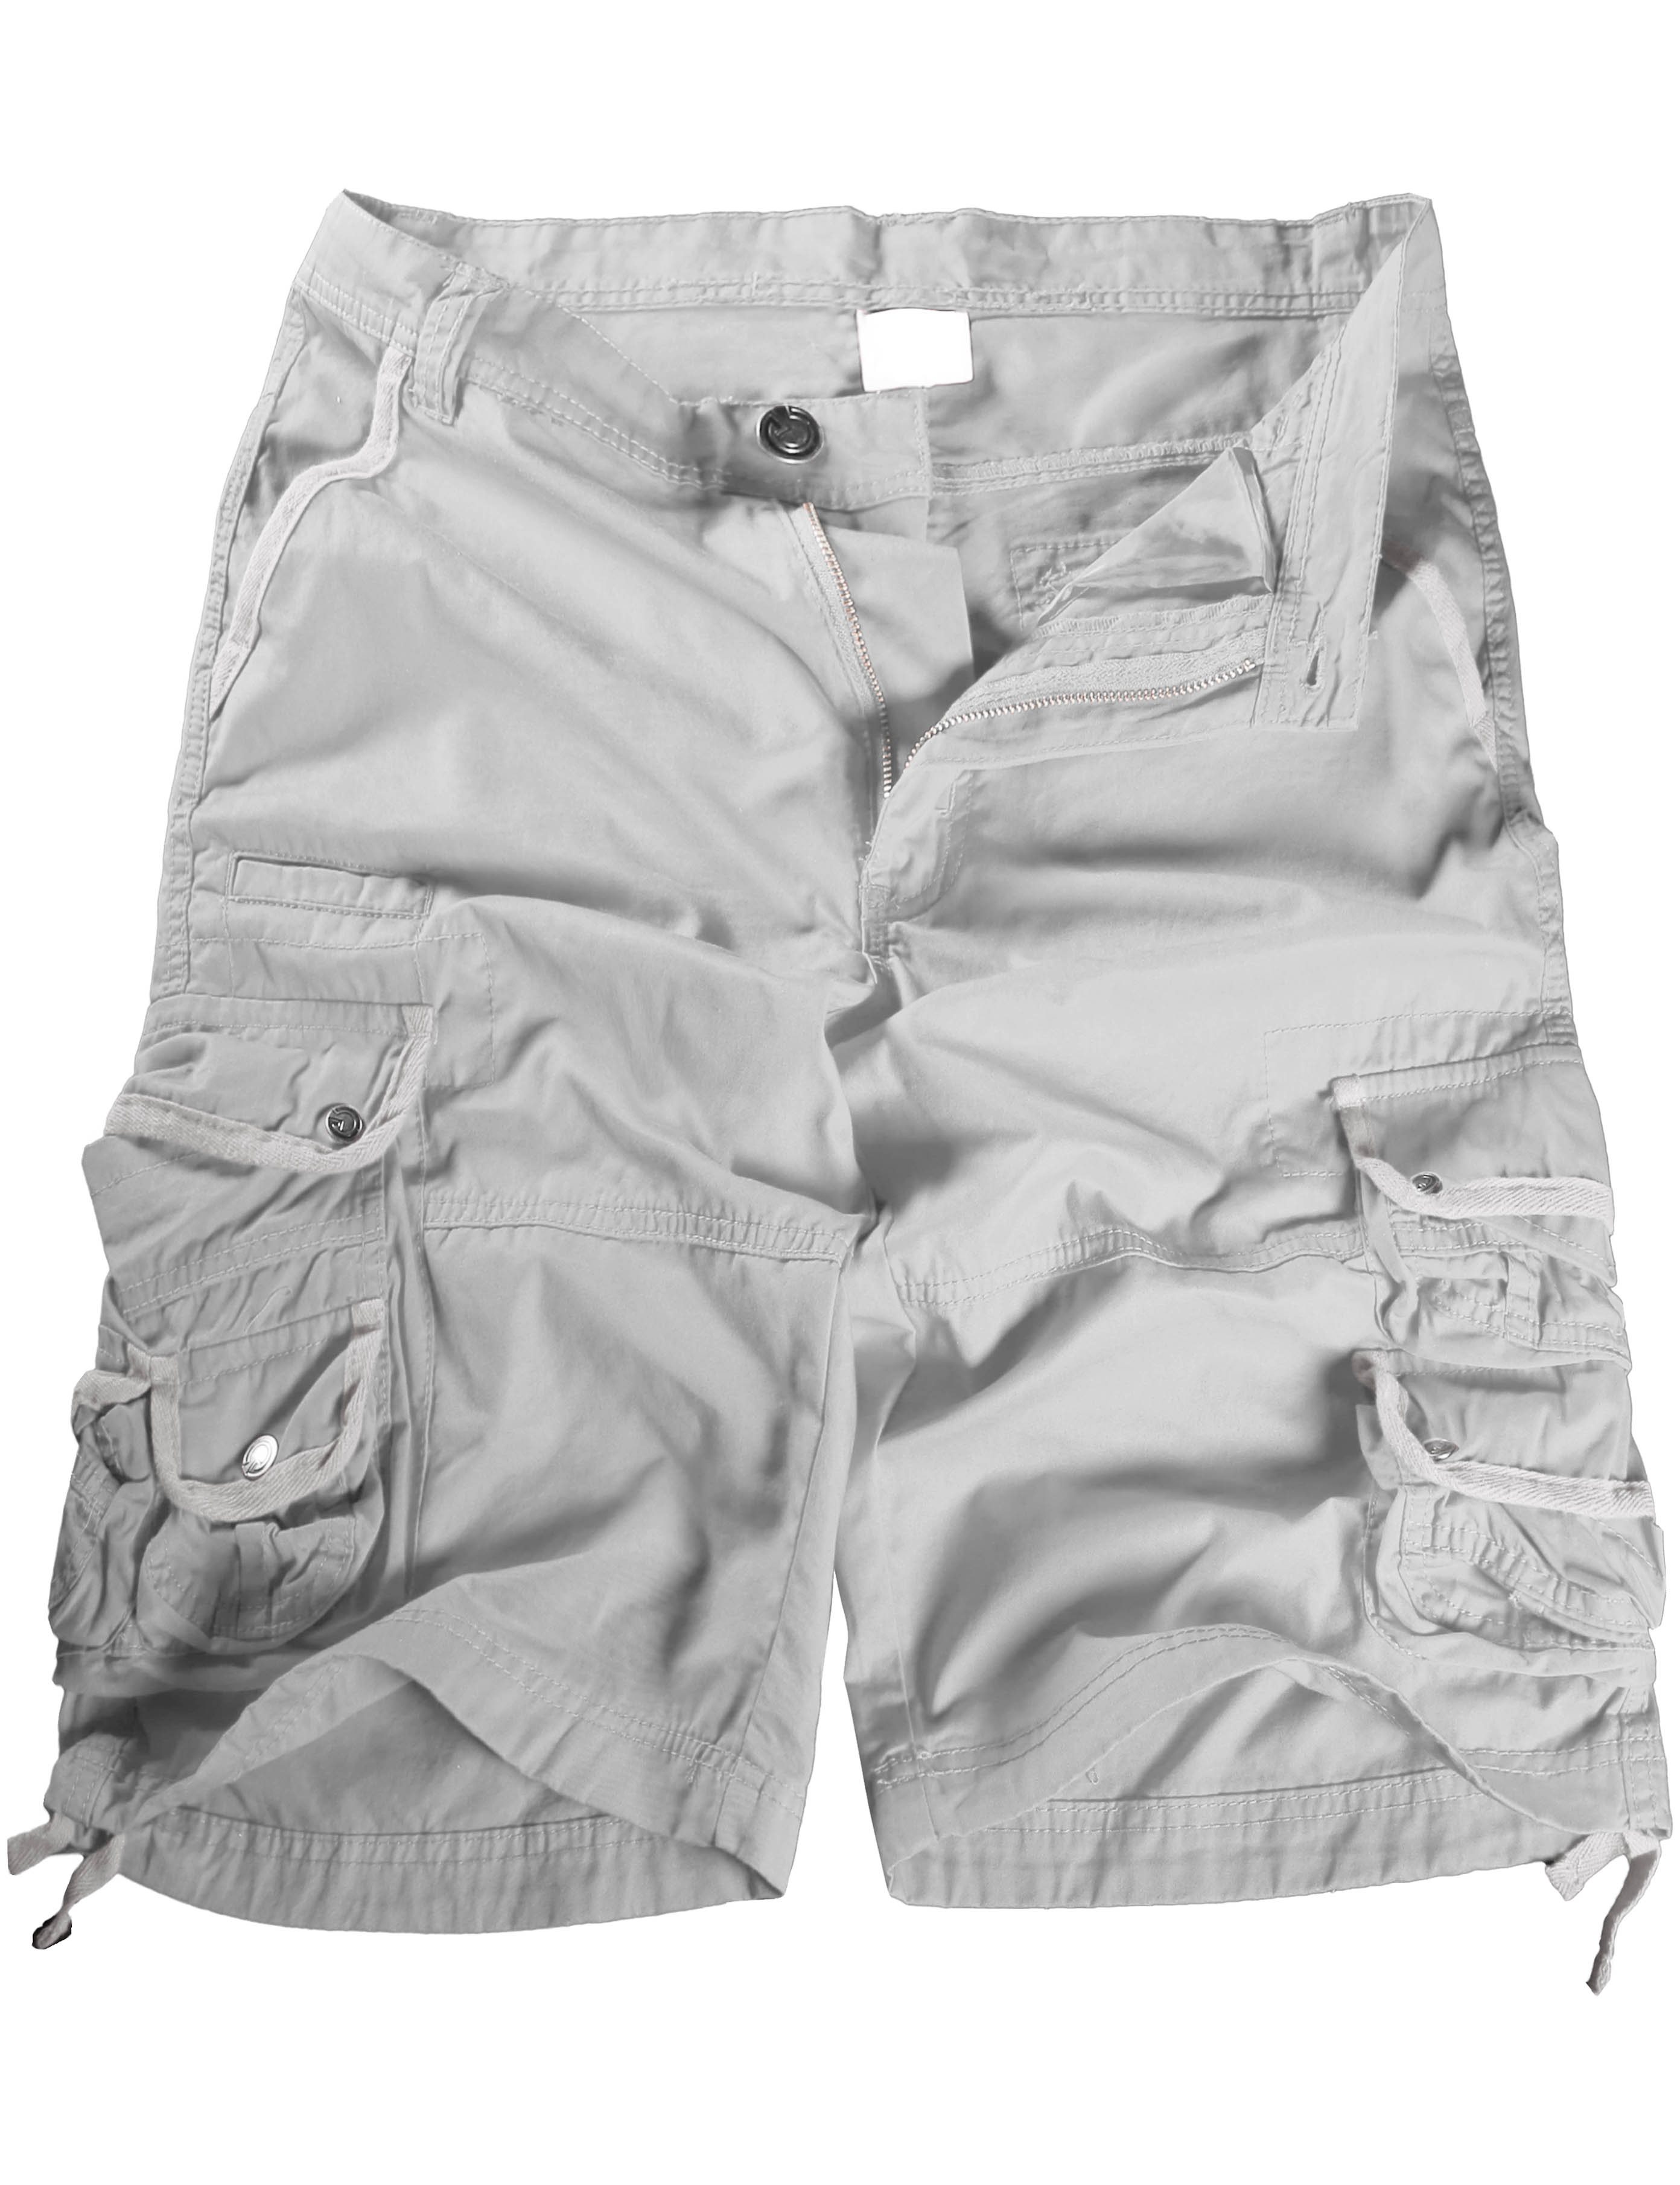 Mens Premium Cargo Shorts Twill Cotton Pants Multi Pocket Work Outdoor Utility